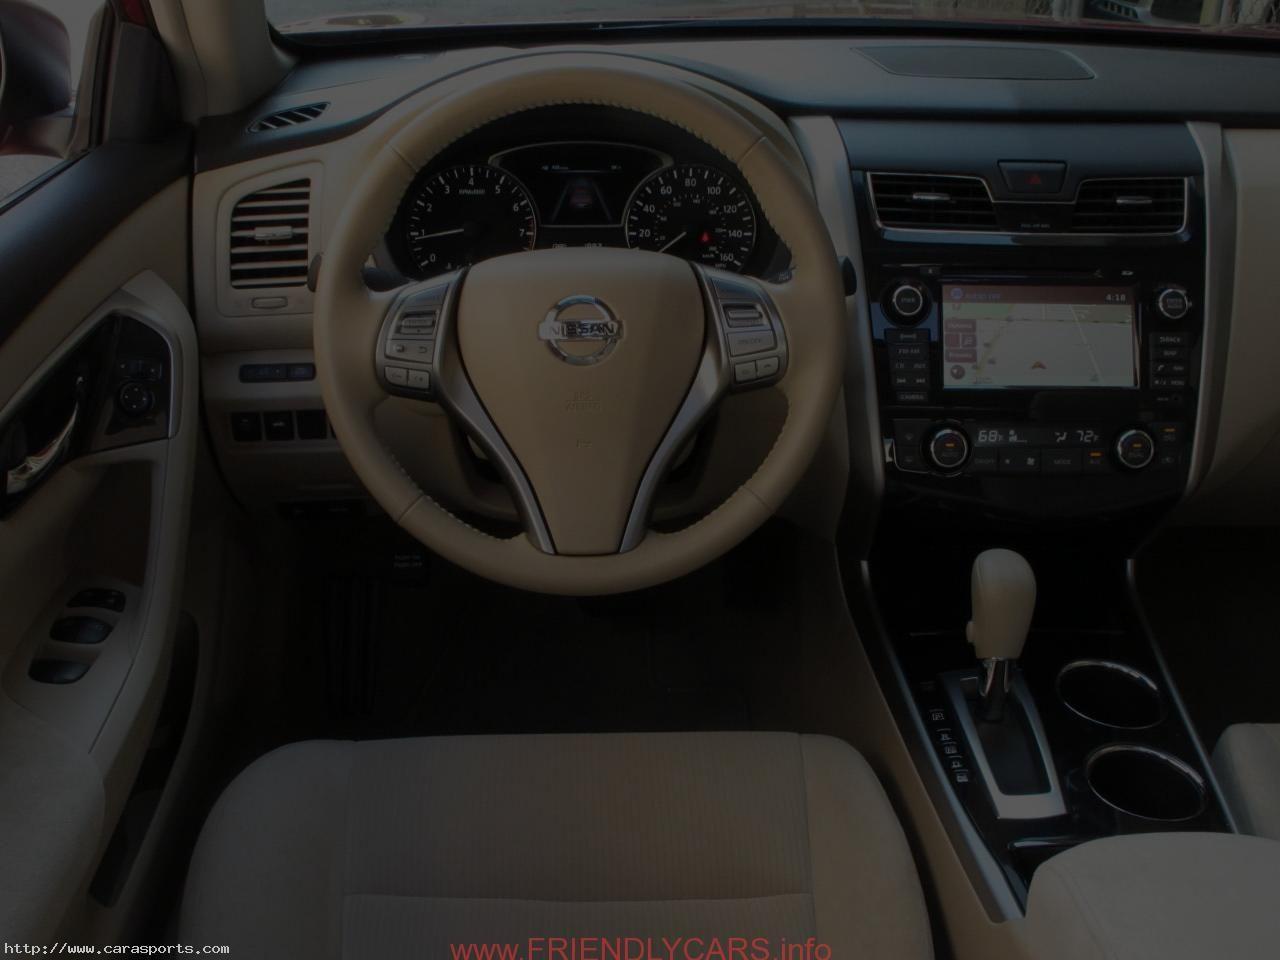 Nice nissan altima 2014 interior car images hd nissan altima 2014 pics 1280x960 1189 carasports